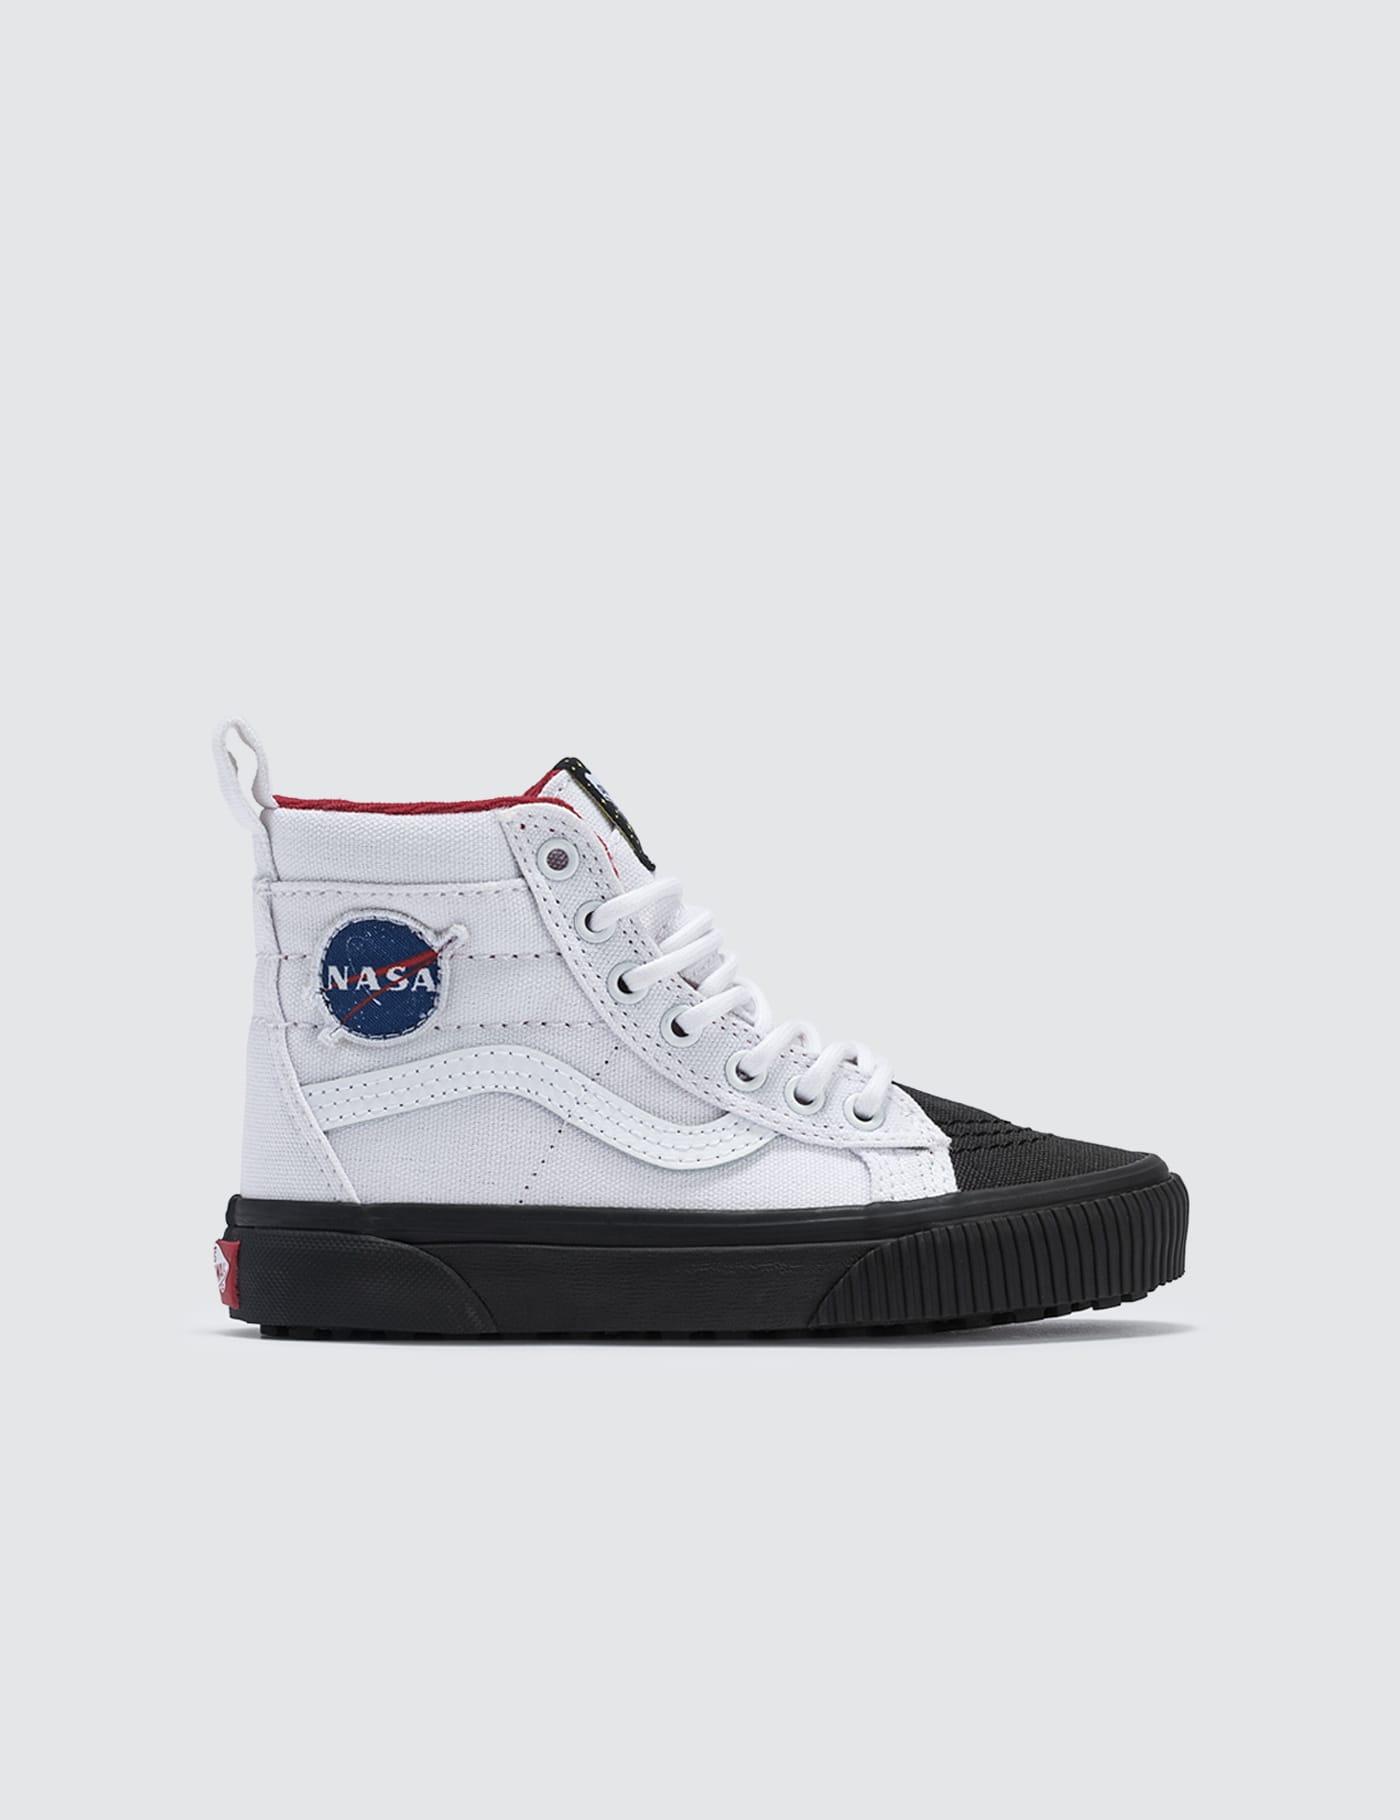 Vans Space Voyager SK8-HI MTE Kids   HBX